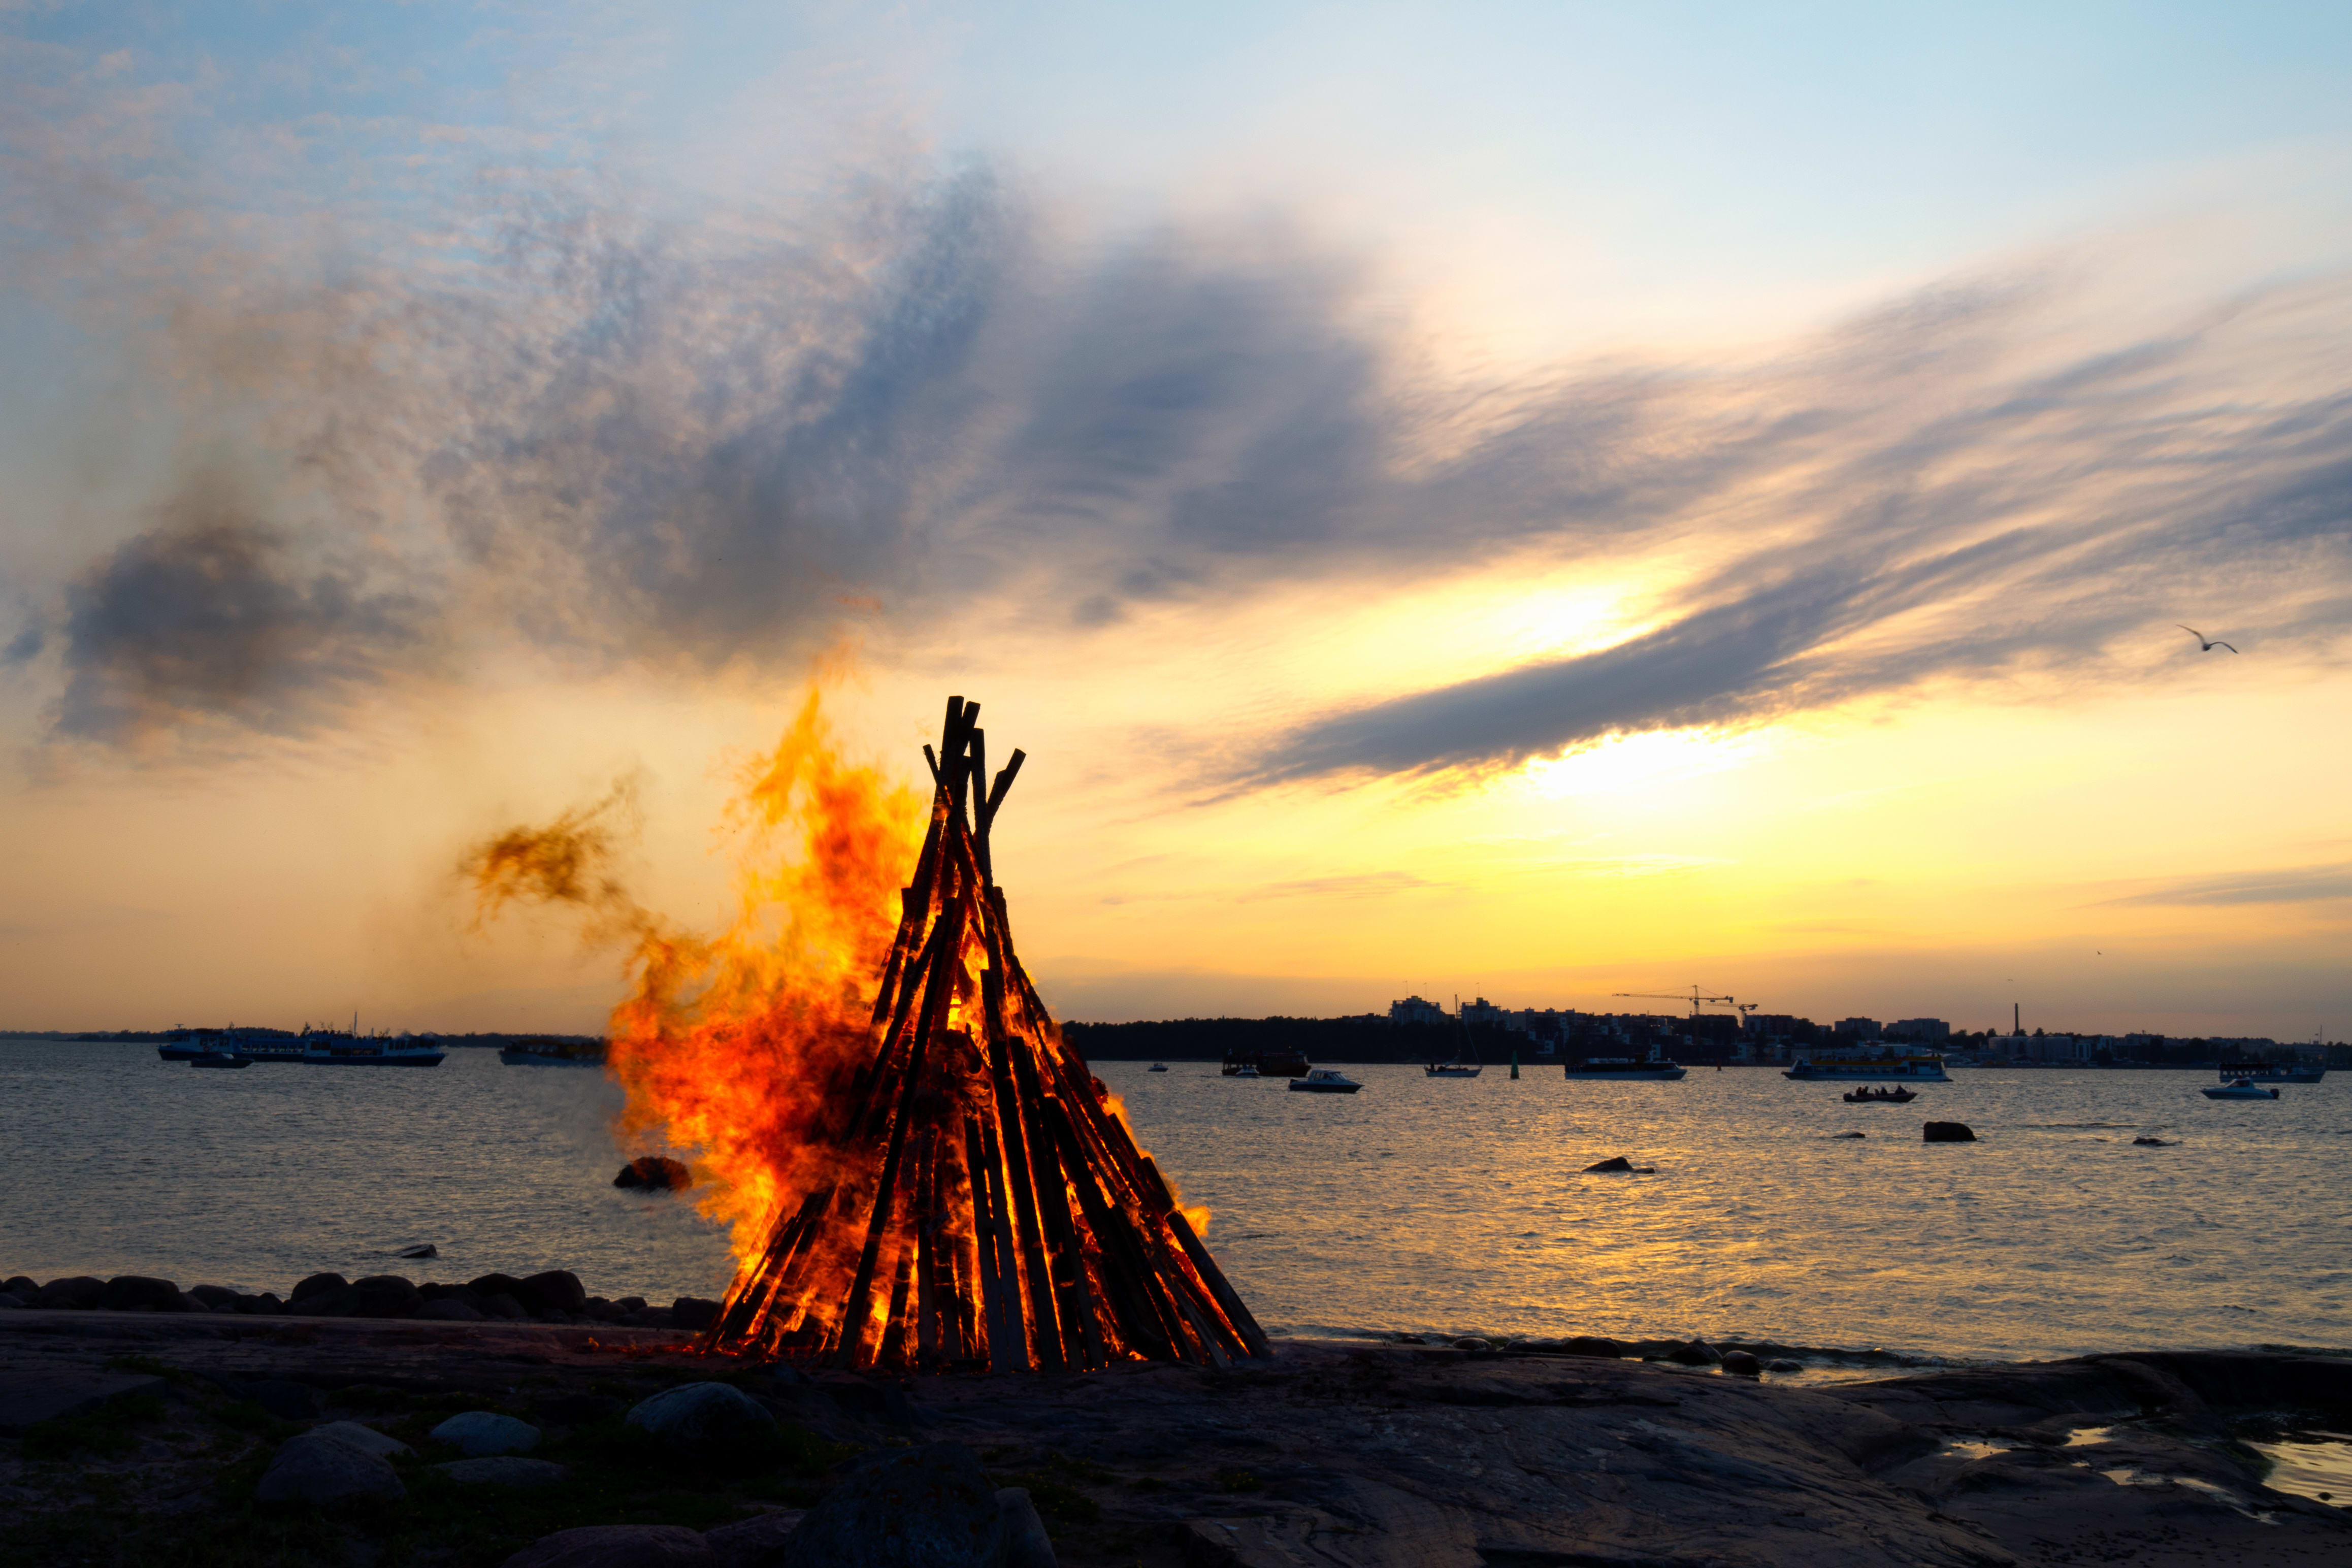 Midsummer bonfire on a coast